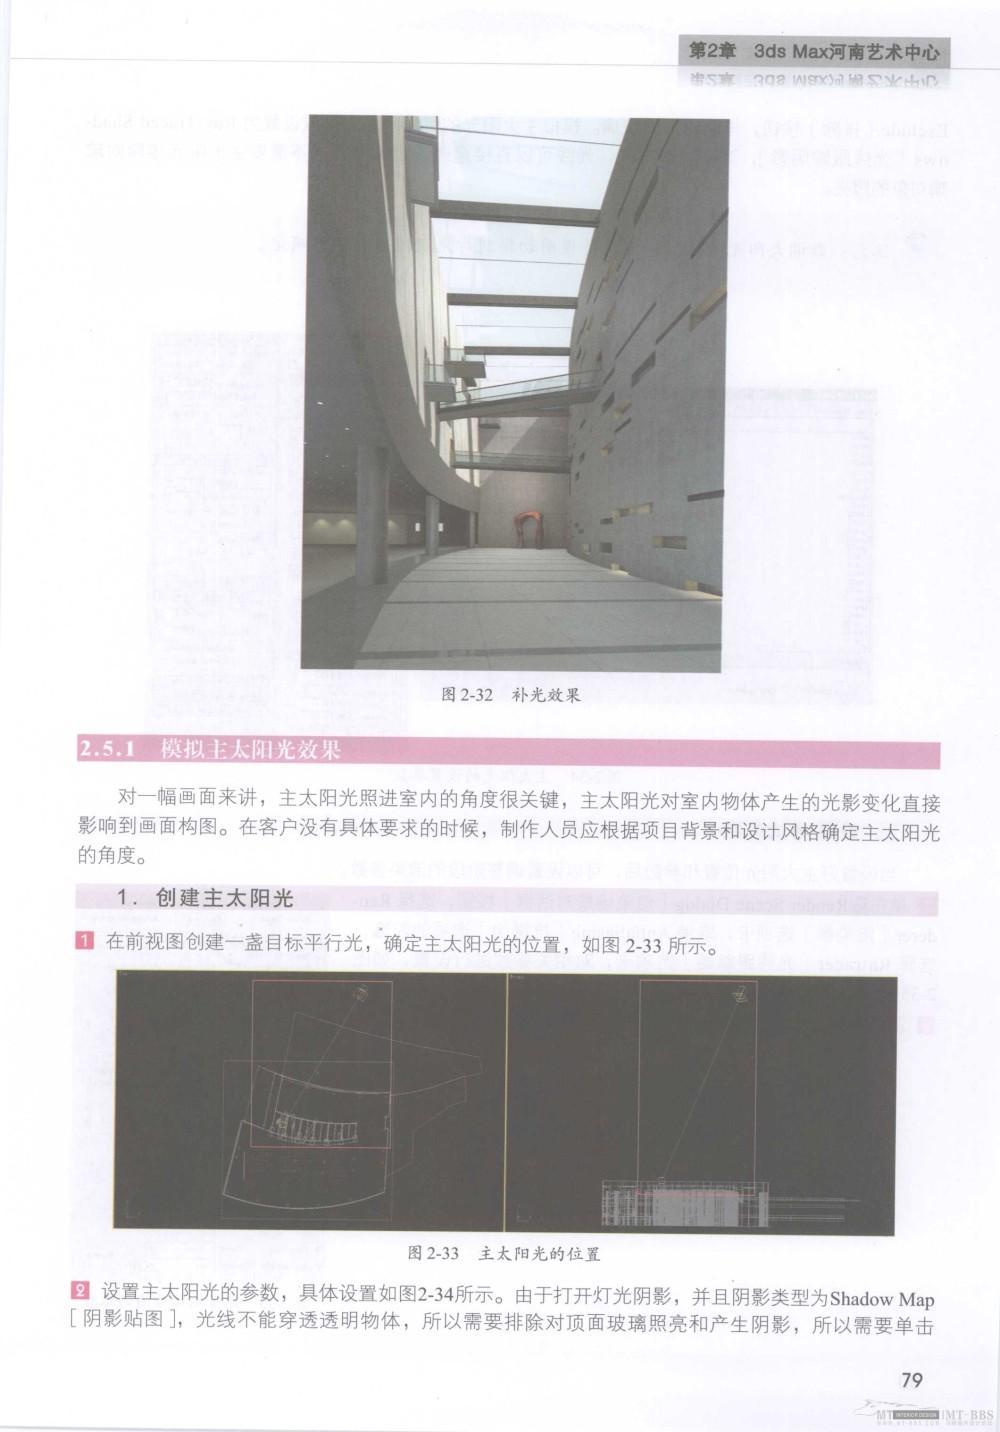 水晶石技法-3ds_Max&VRay室内空间表现_水晶石技法-3ds_Max&VRay室内空间表现_页面_085.jpg